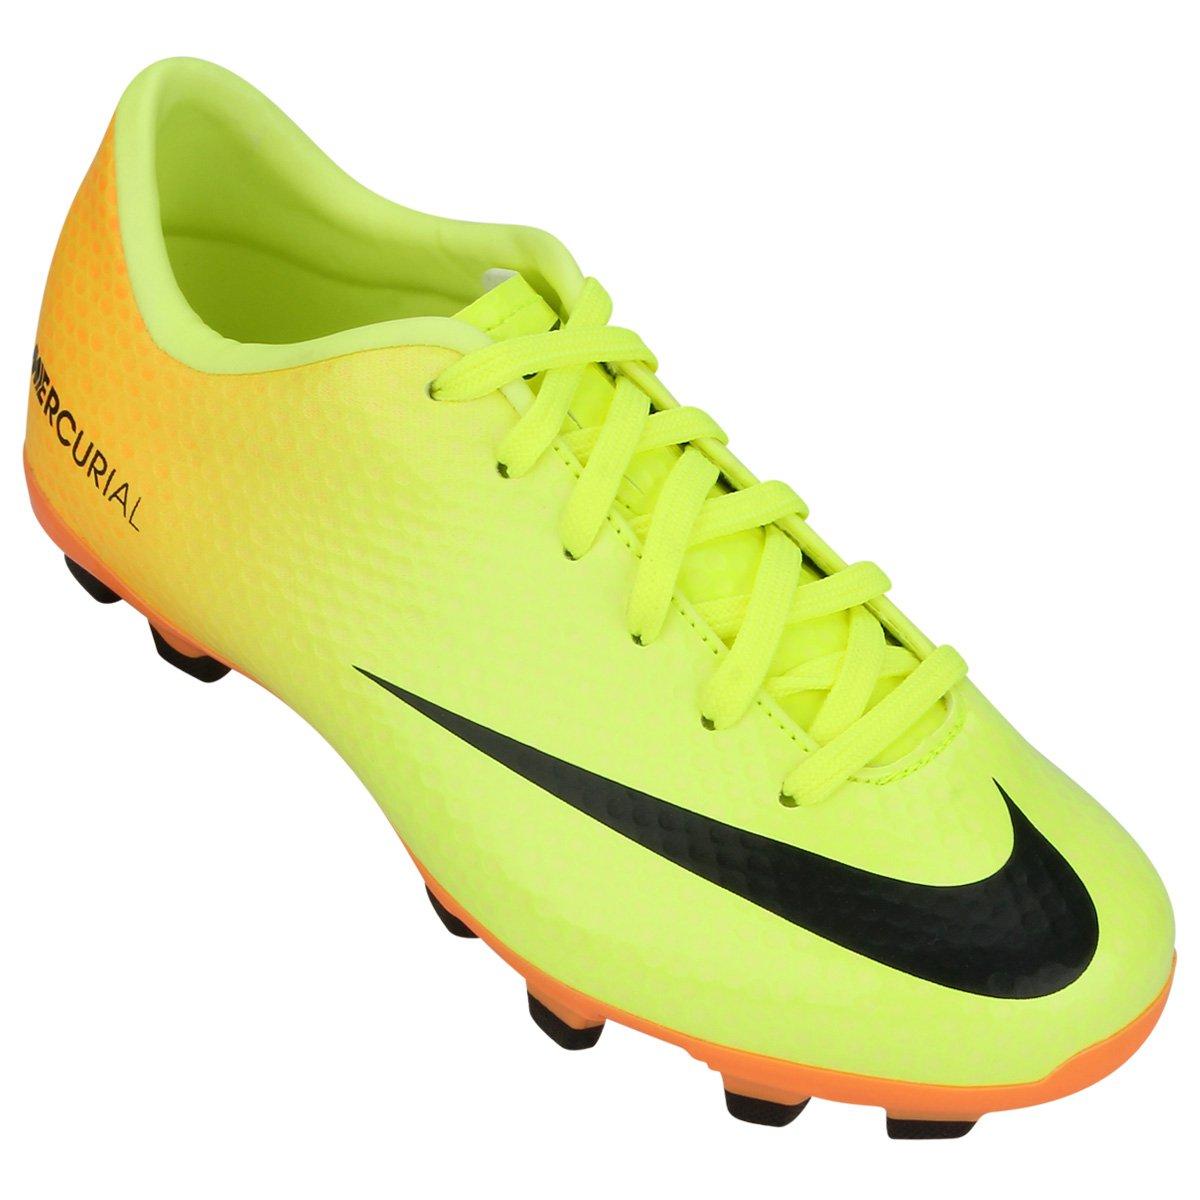 41facad83d ... Chuteira Nike Mercurial Victory 4 FG EMB Infantil - Verde Limão e  Laranja ...